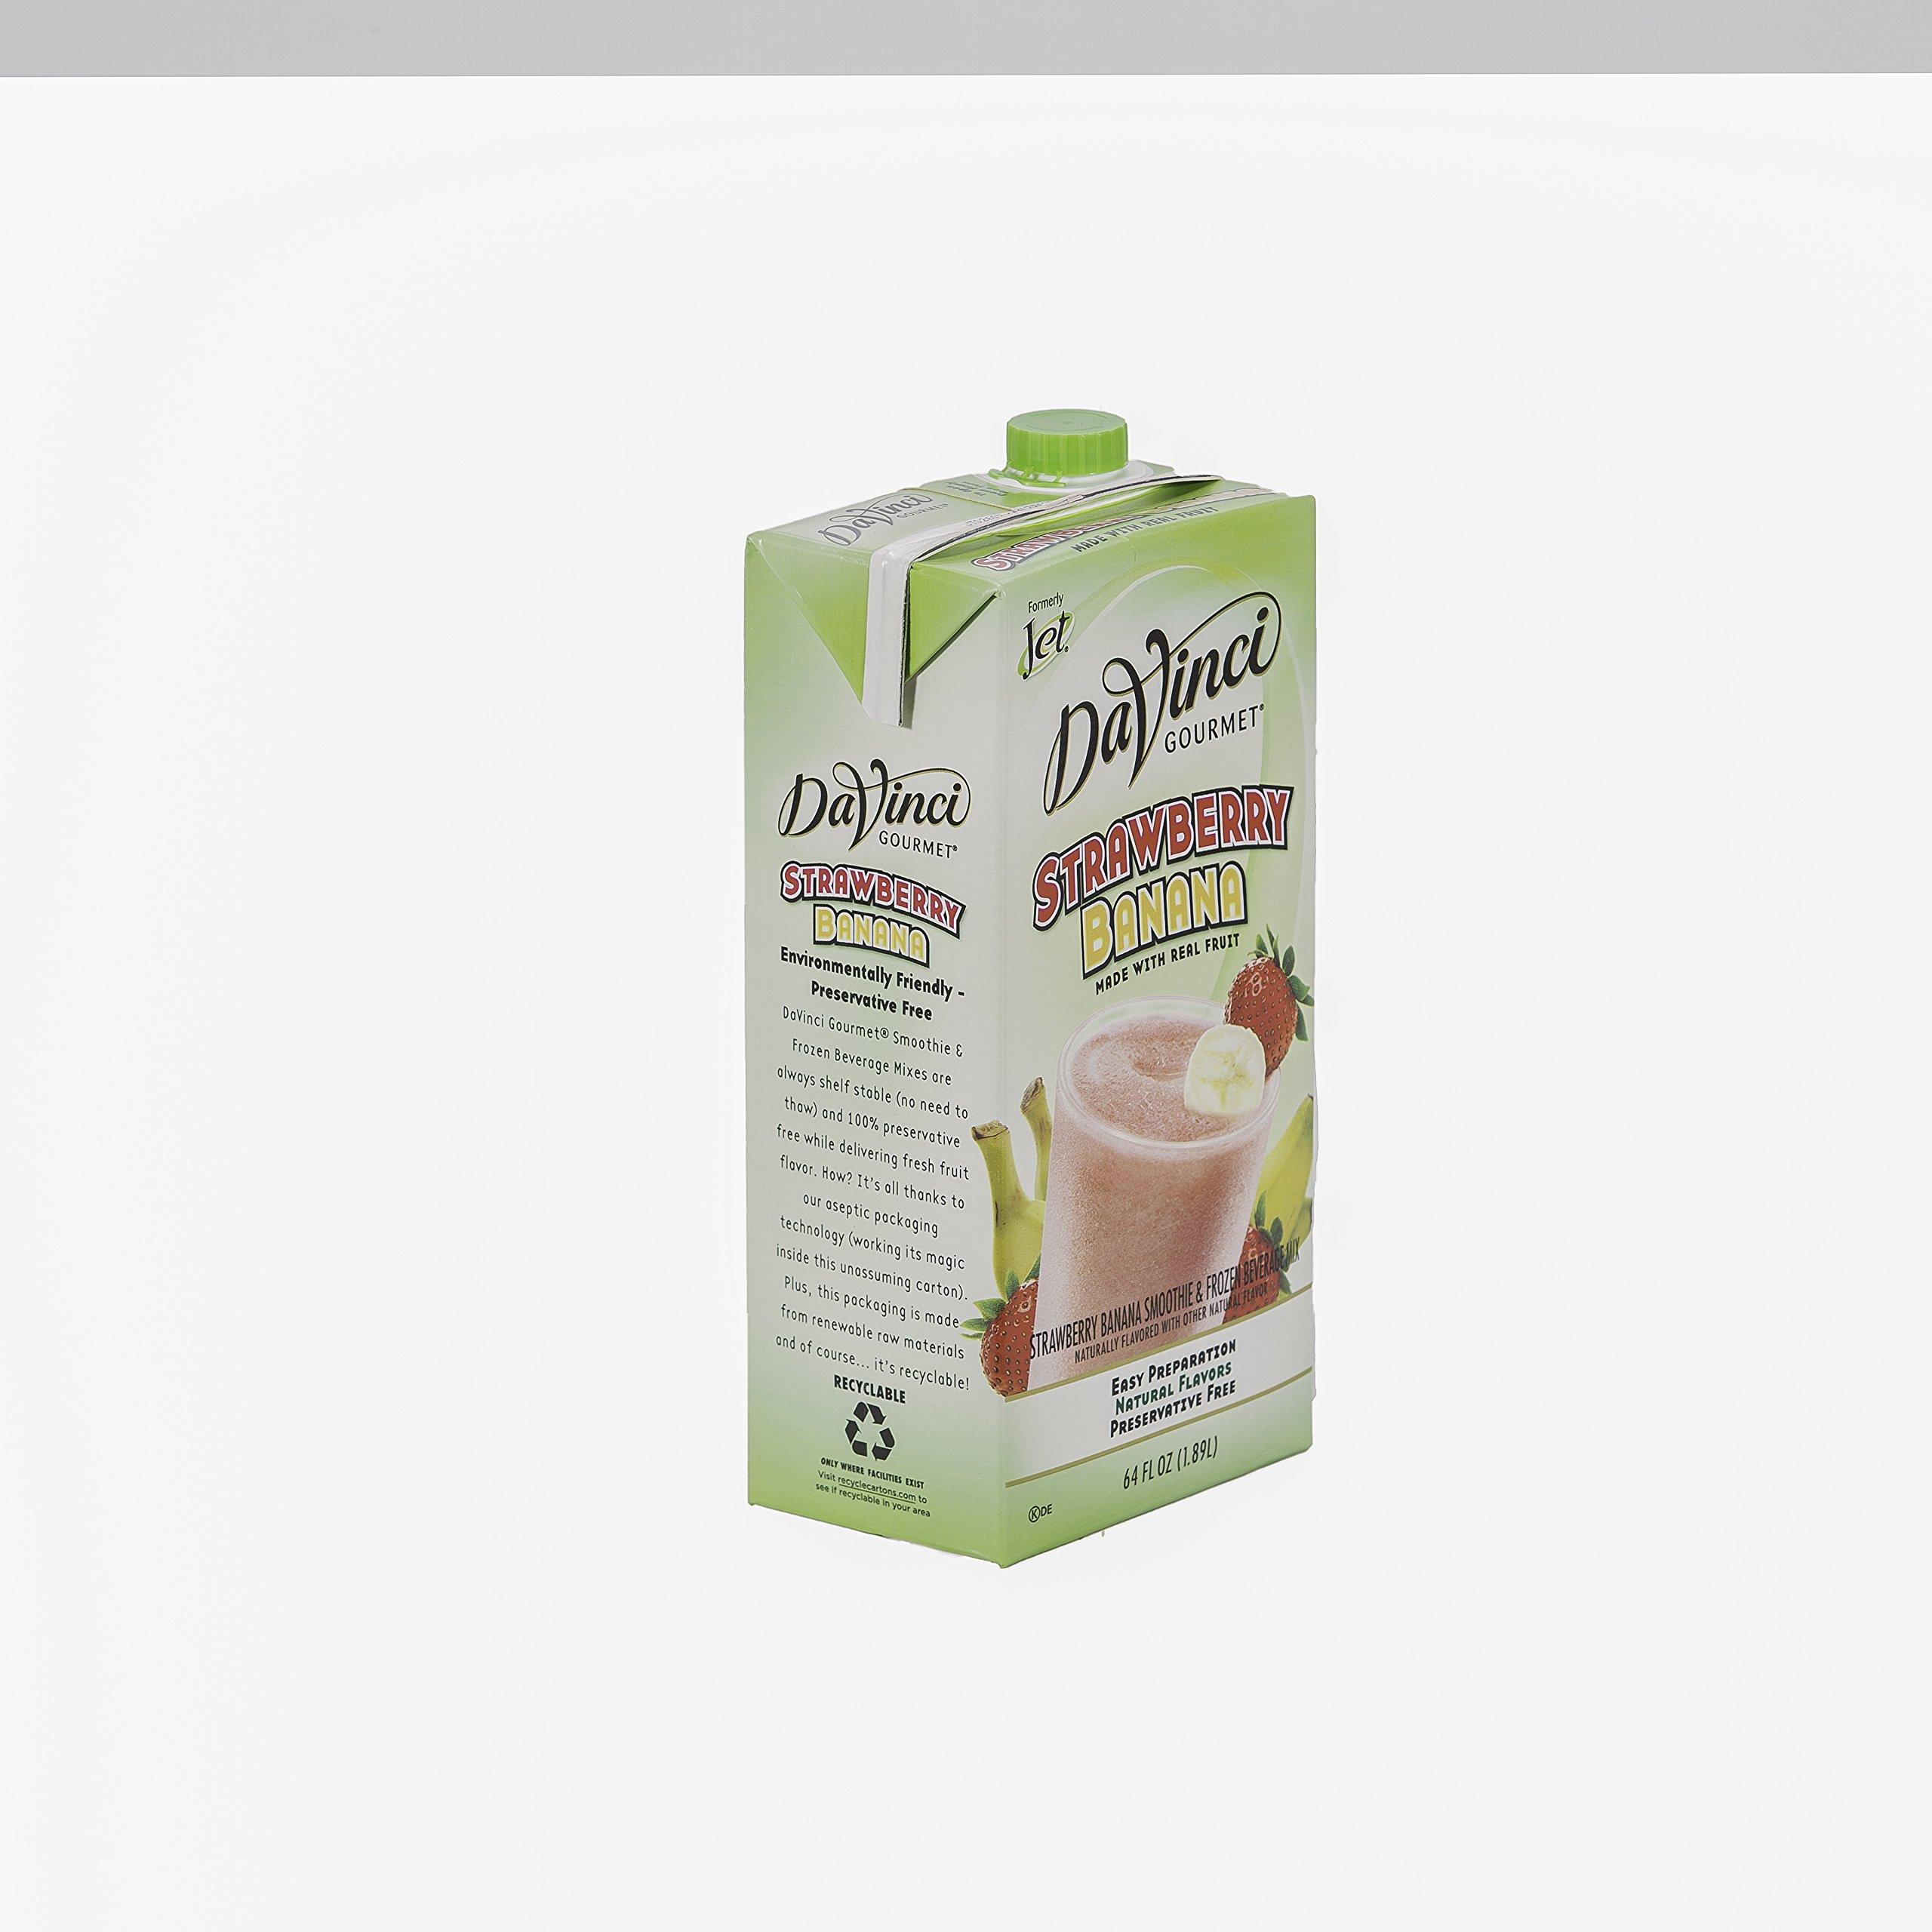 DaVinci Gourmet Strawberry Banana Smoothie Mix, 64 oz., 6 per case by DaVinci Gourmet